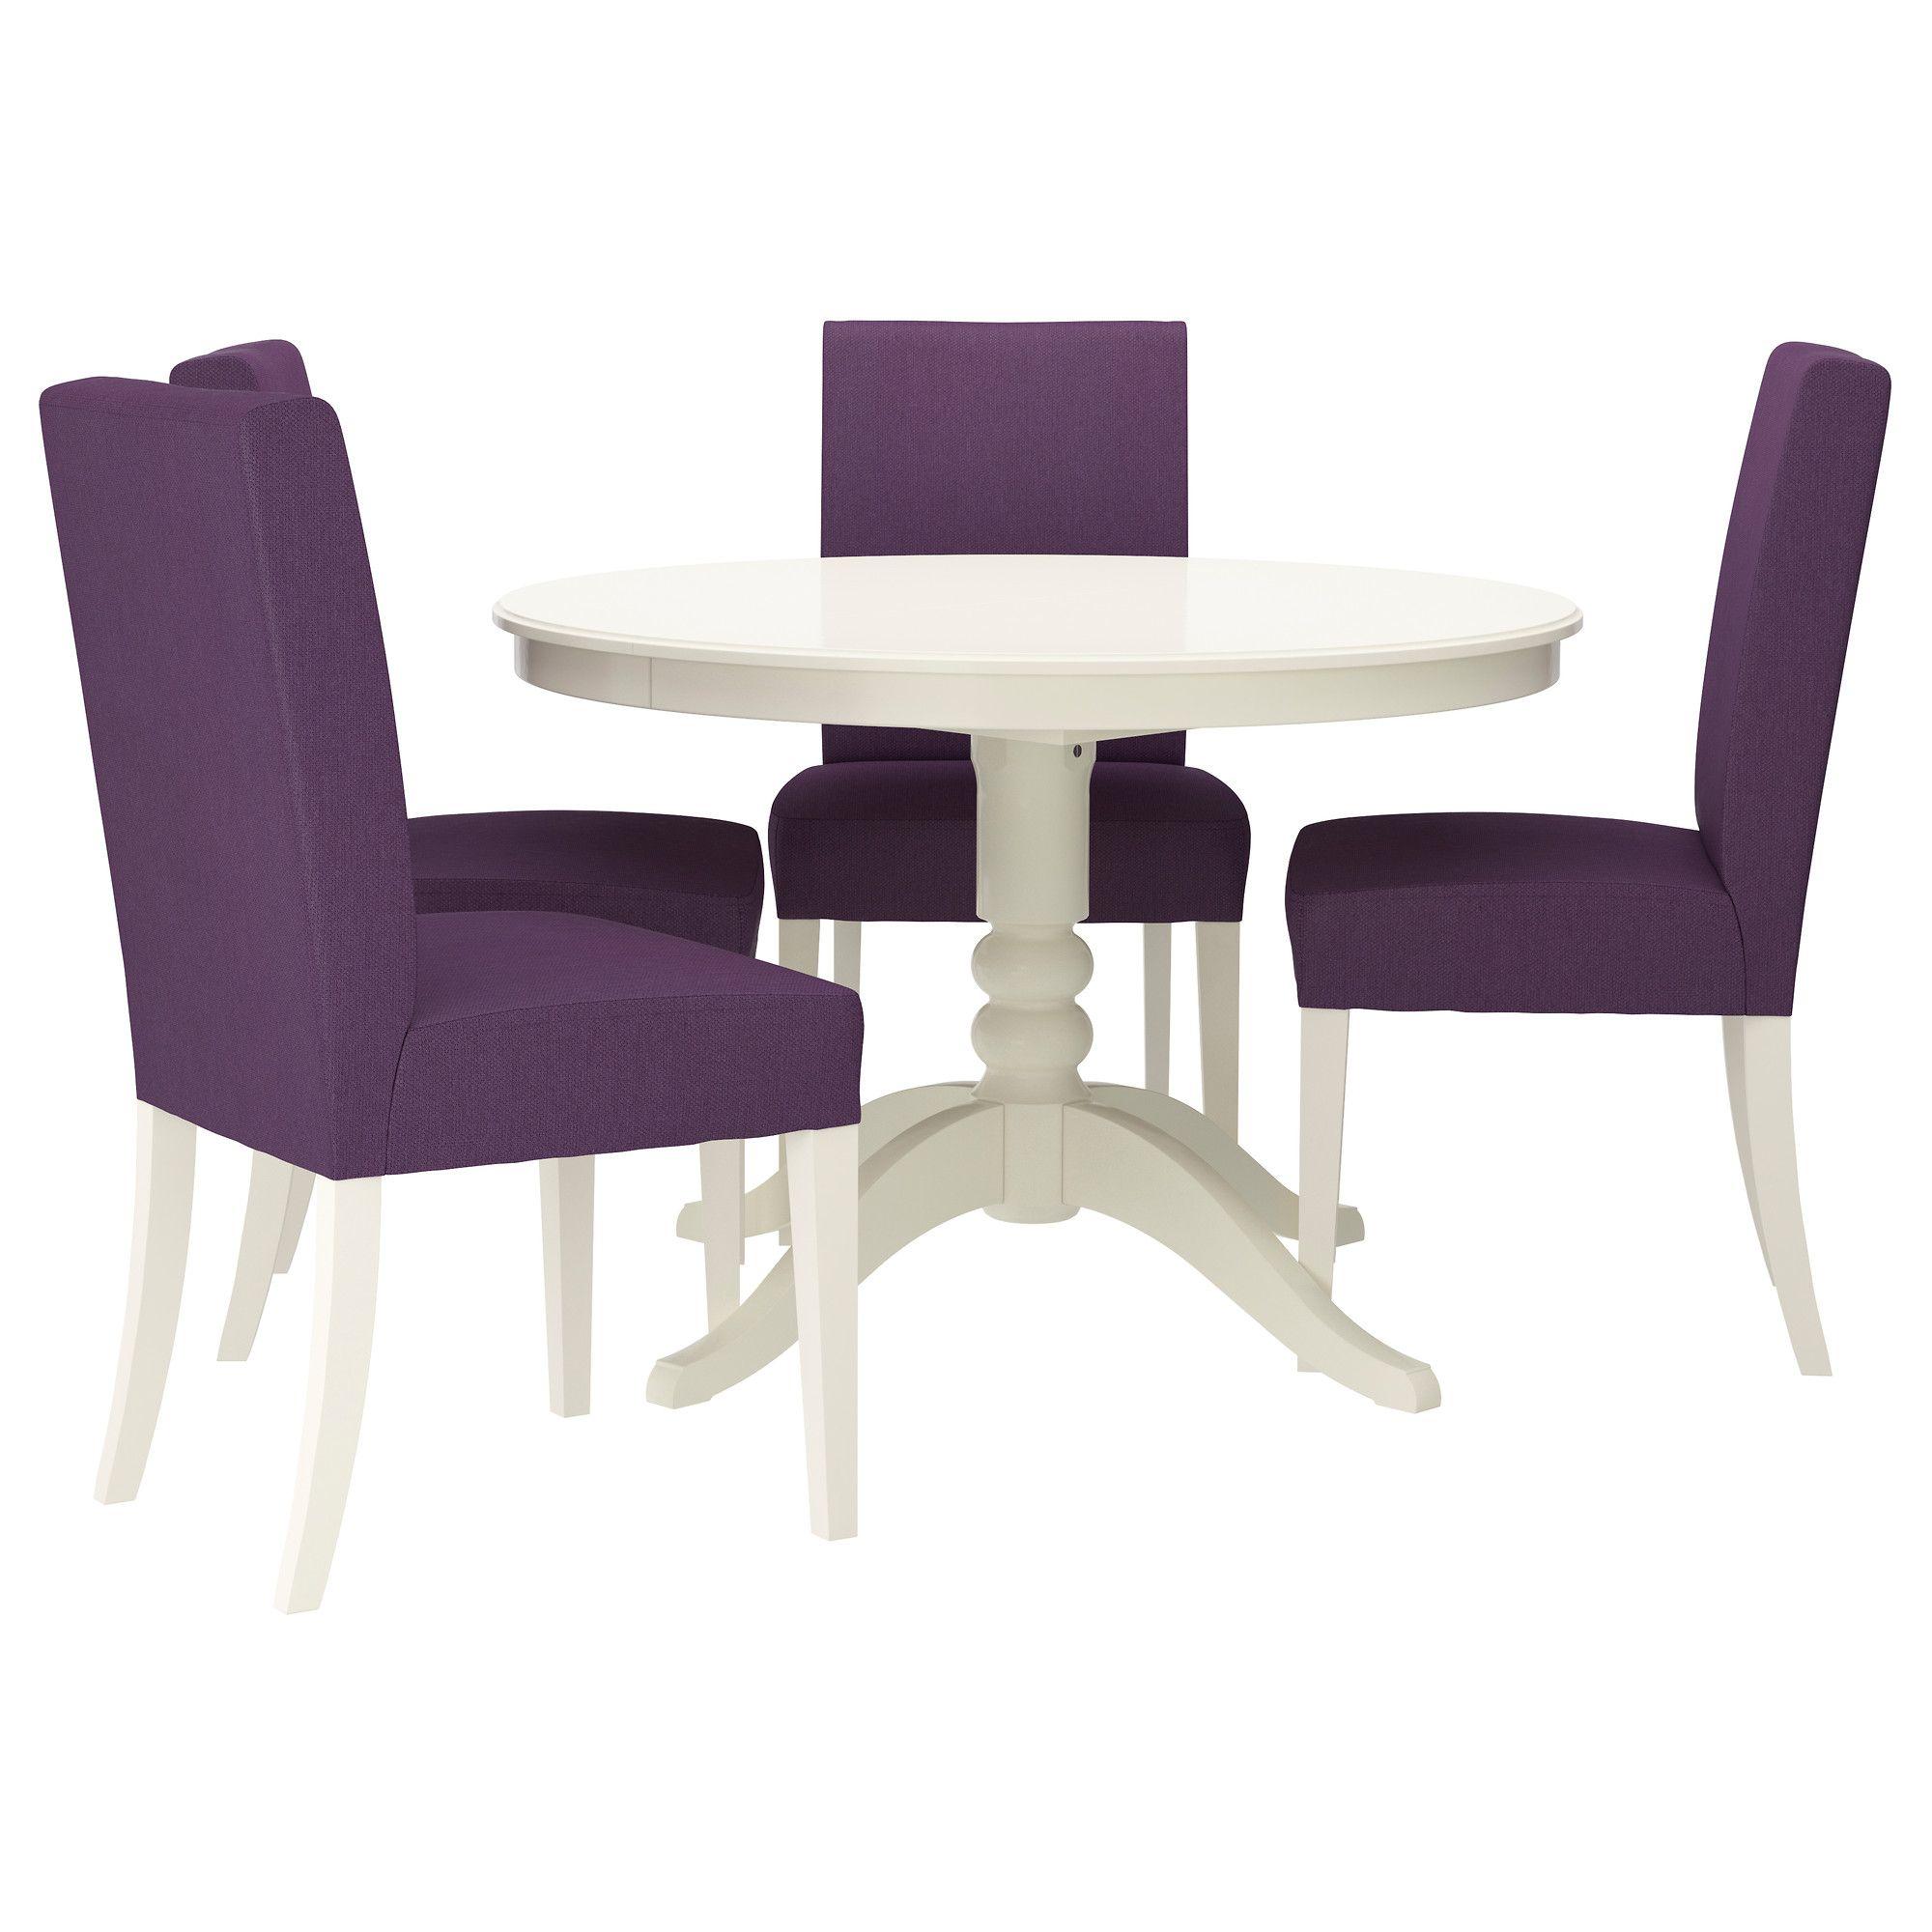 Liatorp henriksdal mesa con 4 sillas ikea comedores for Ikea fusion tafel